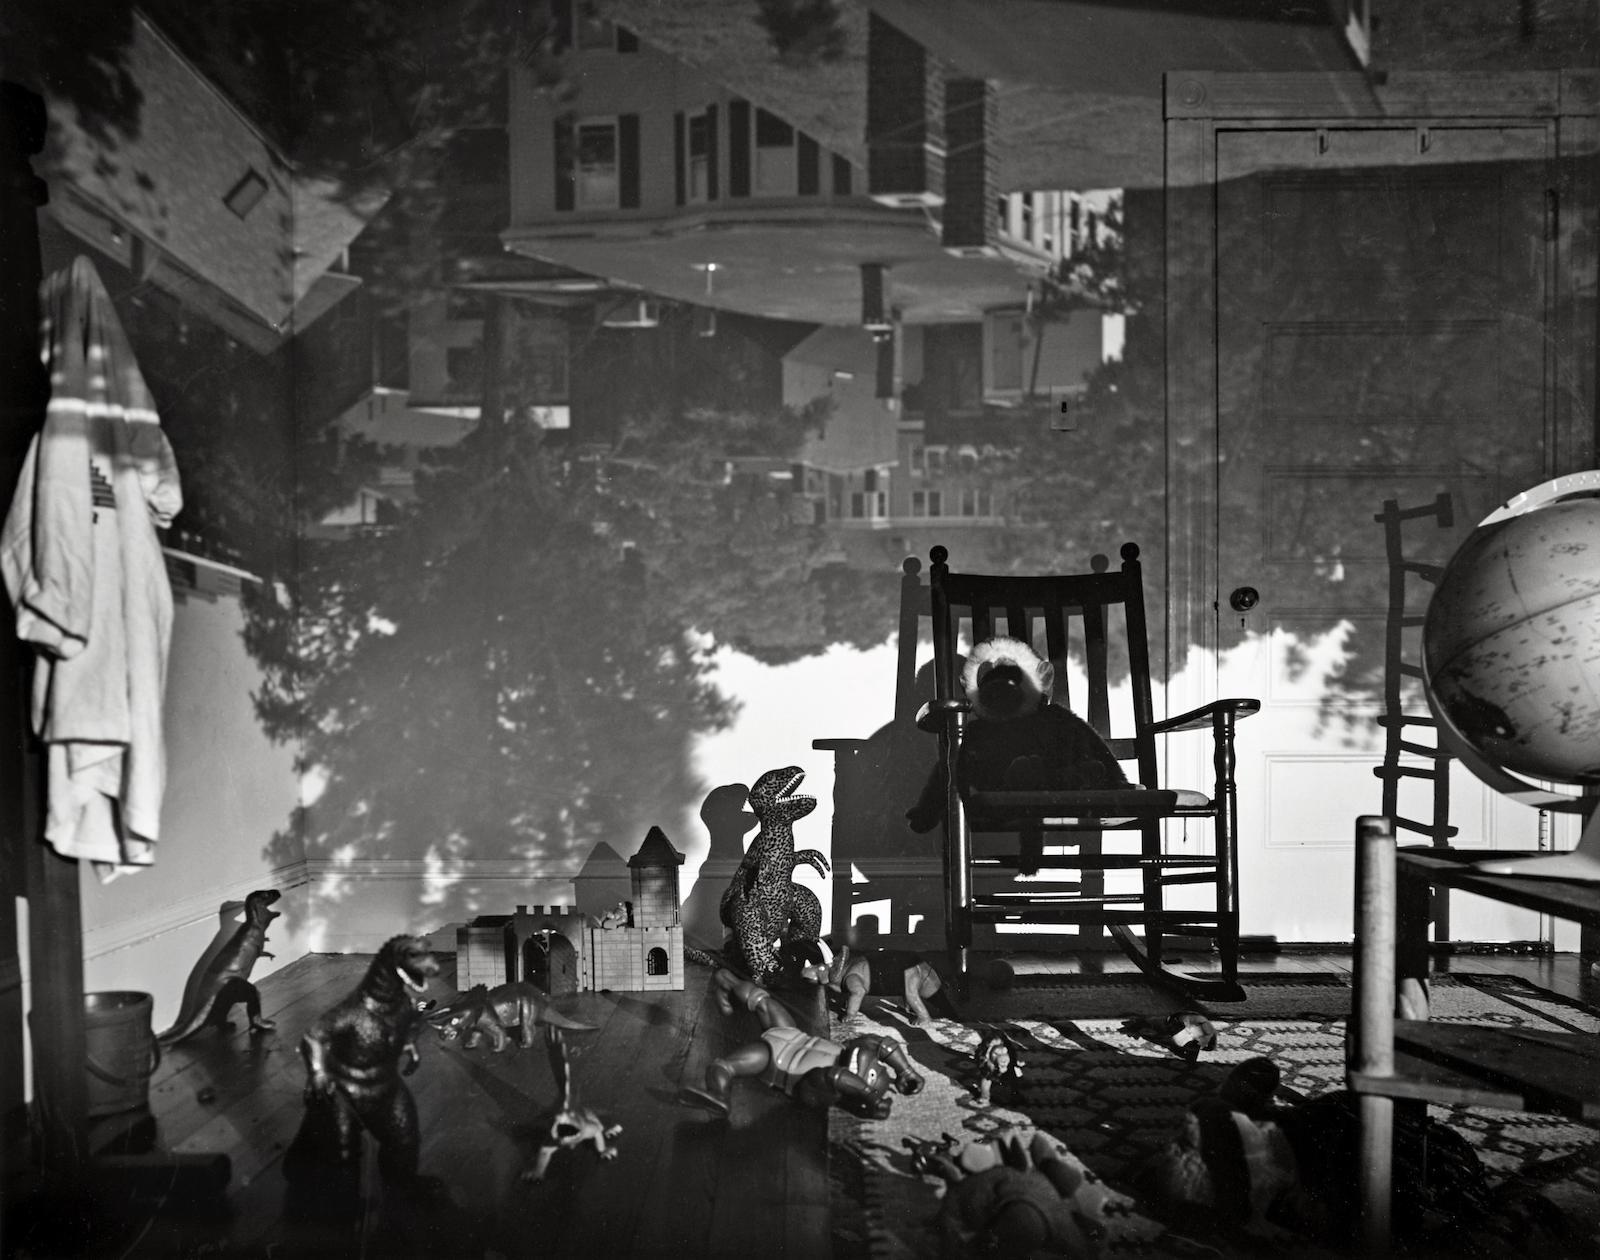 Abelardo Morell-Camera Obscura Image Of Brookline View In Bradys Room-1992